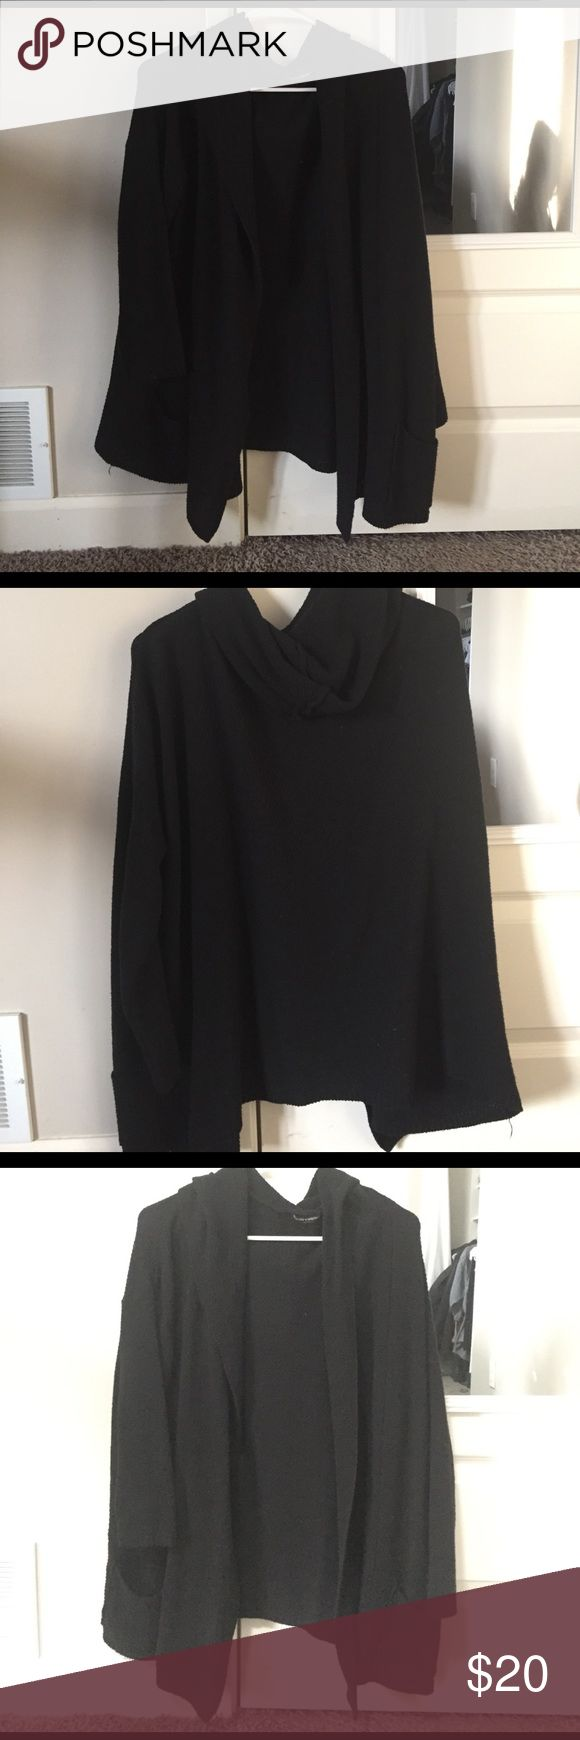 Brandy Melville cardigan Black open cardigan with good and pockets. Brandy Melville Brandy Melville Sweaters Cardigans